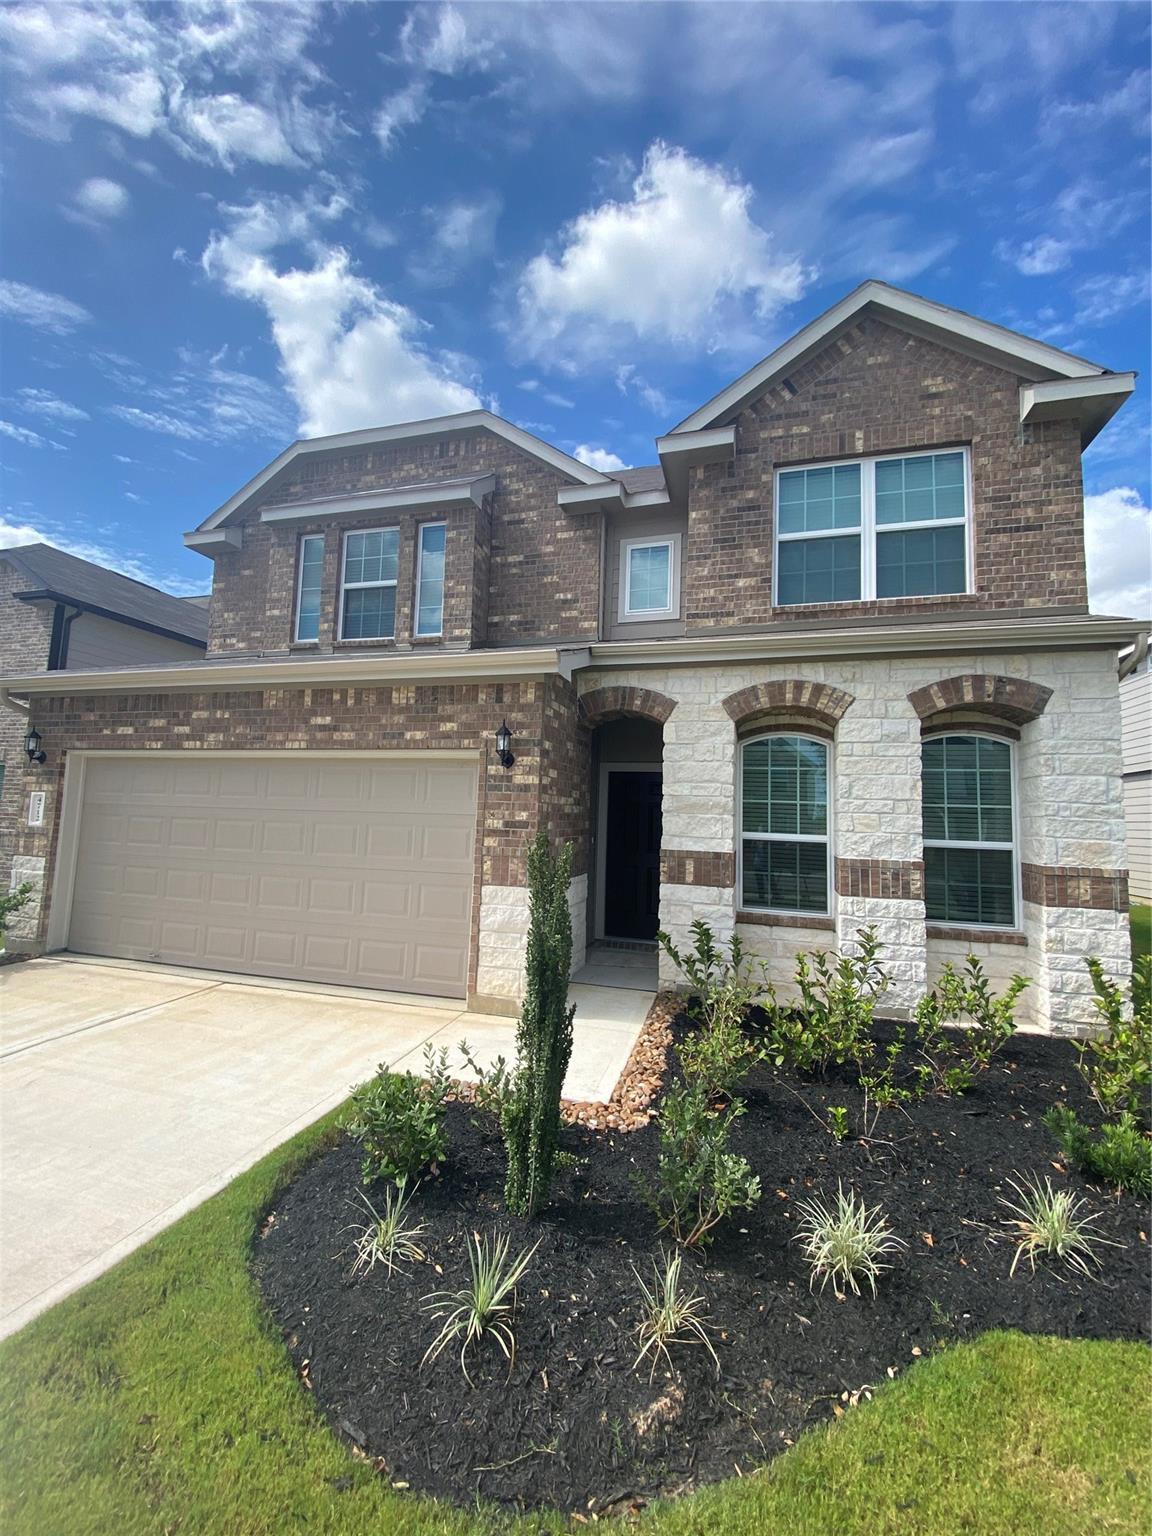 4712 Los Pines Way Property Photo - Bryan, TX real estate listing